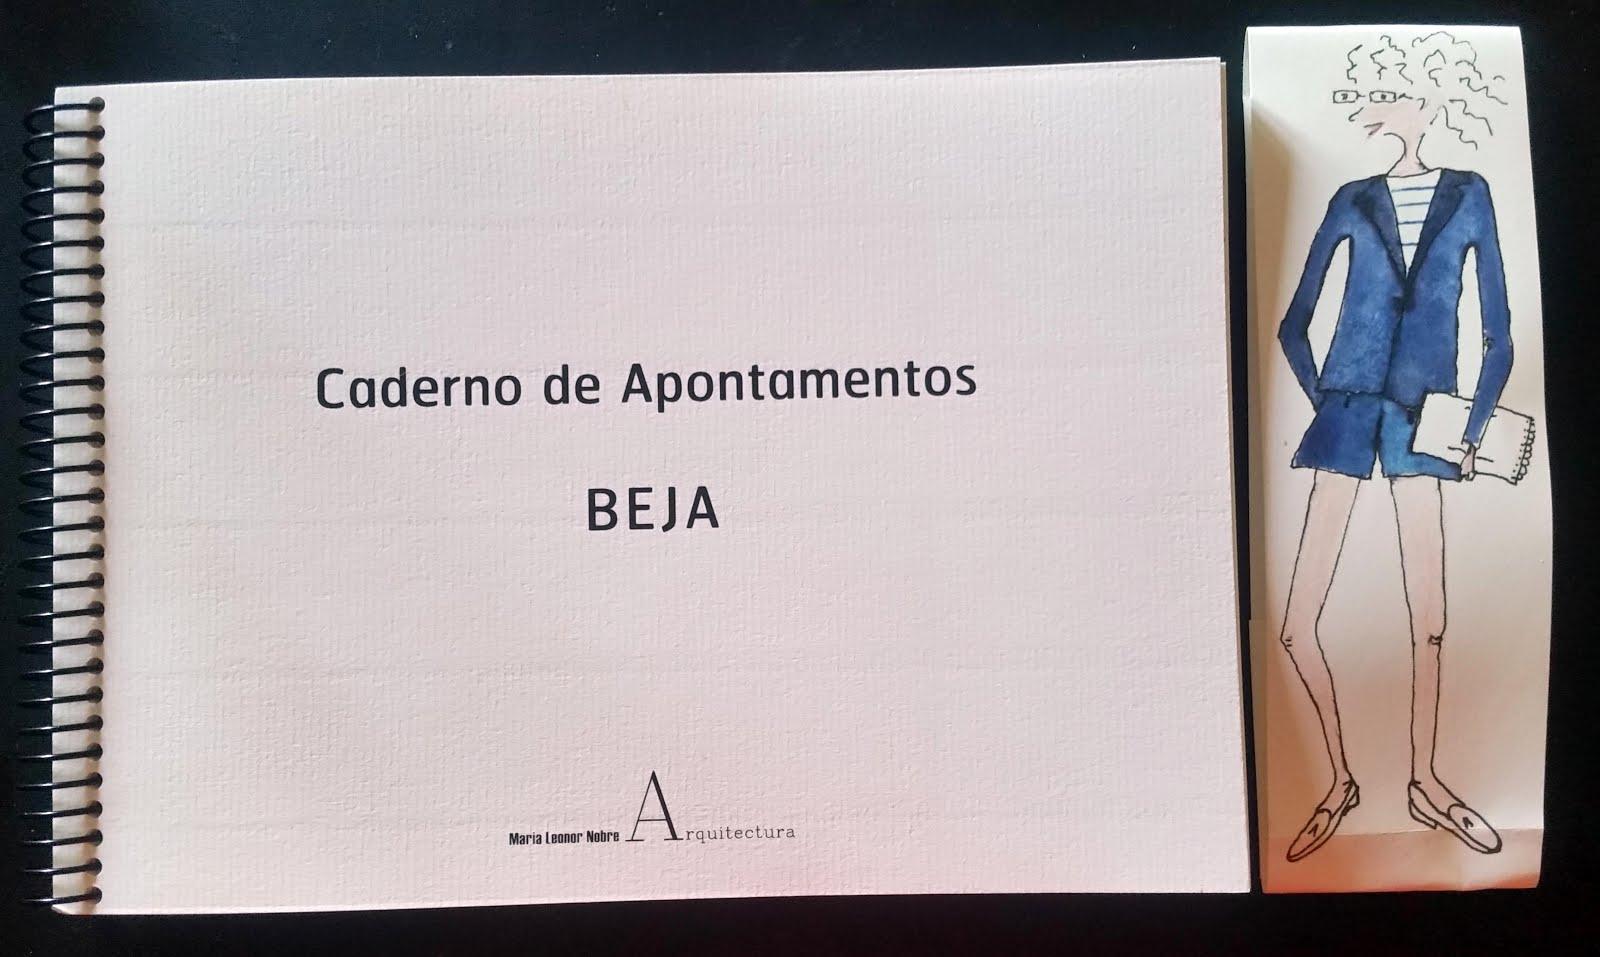 'Cadernos de Apontamentos Beja' - Maria Leonor Nobre